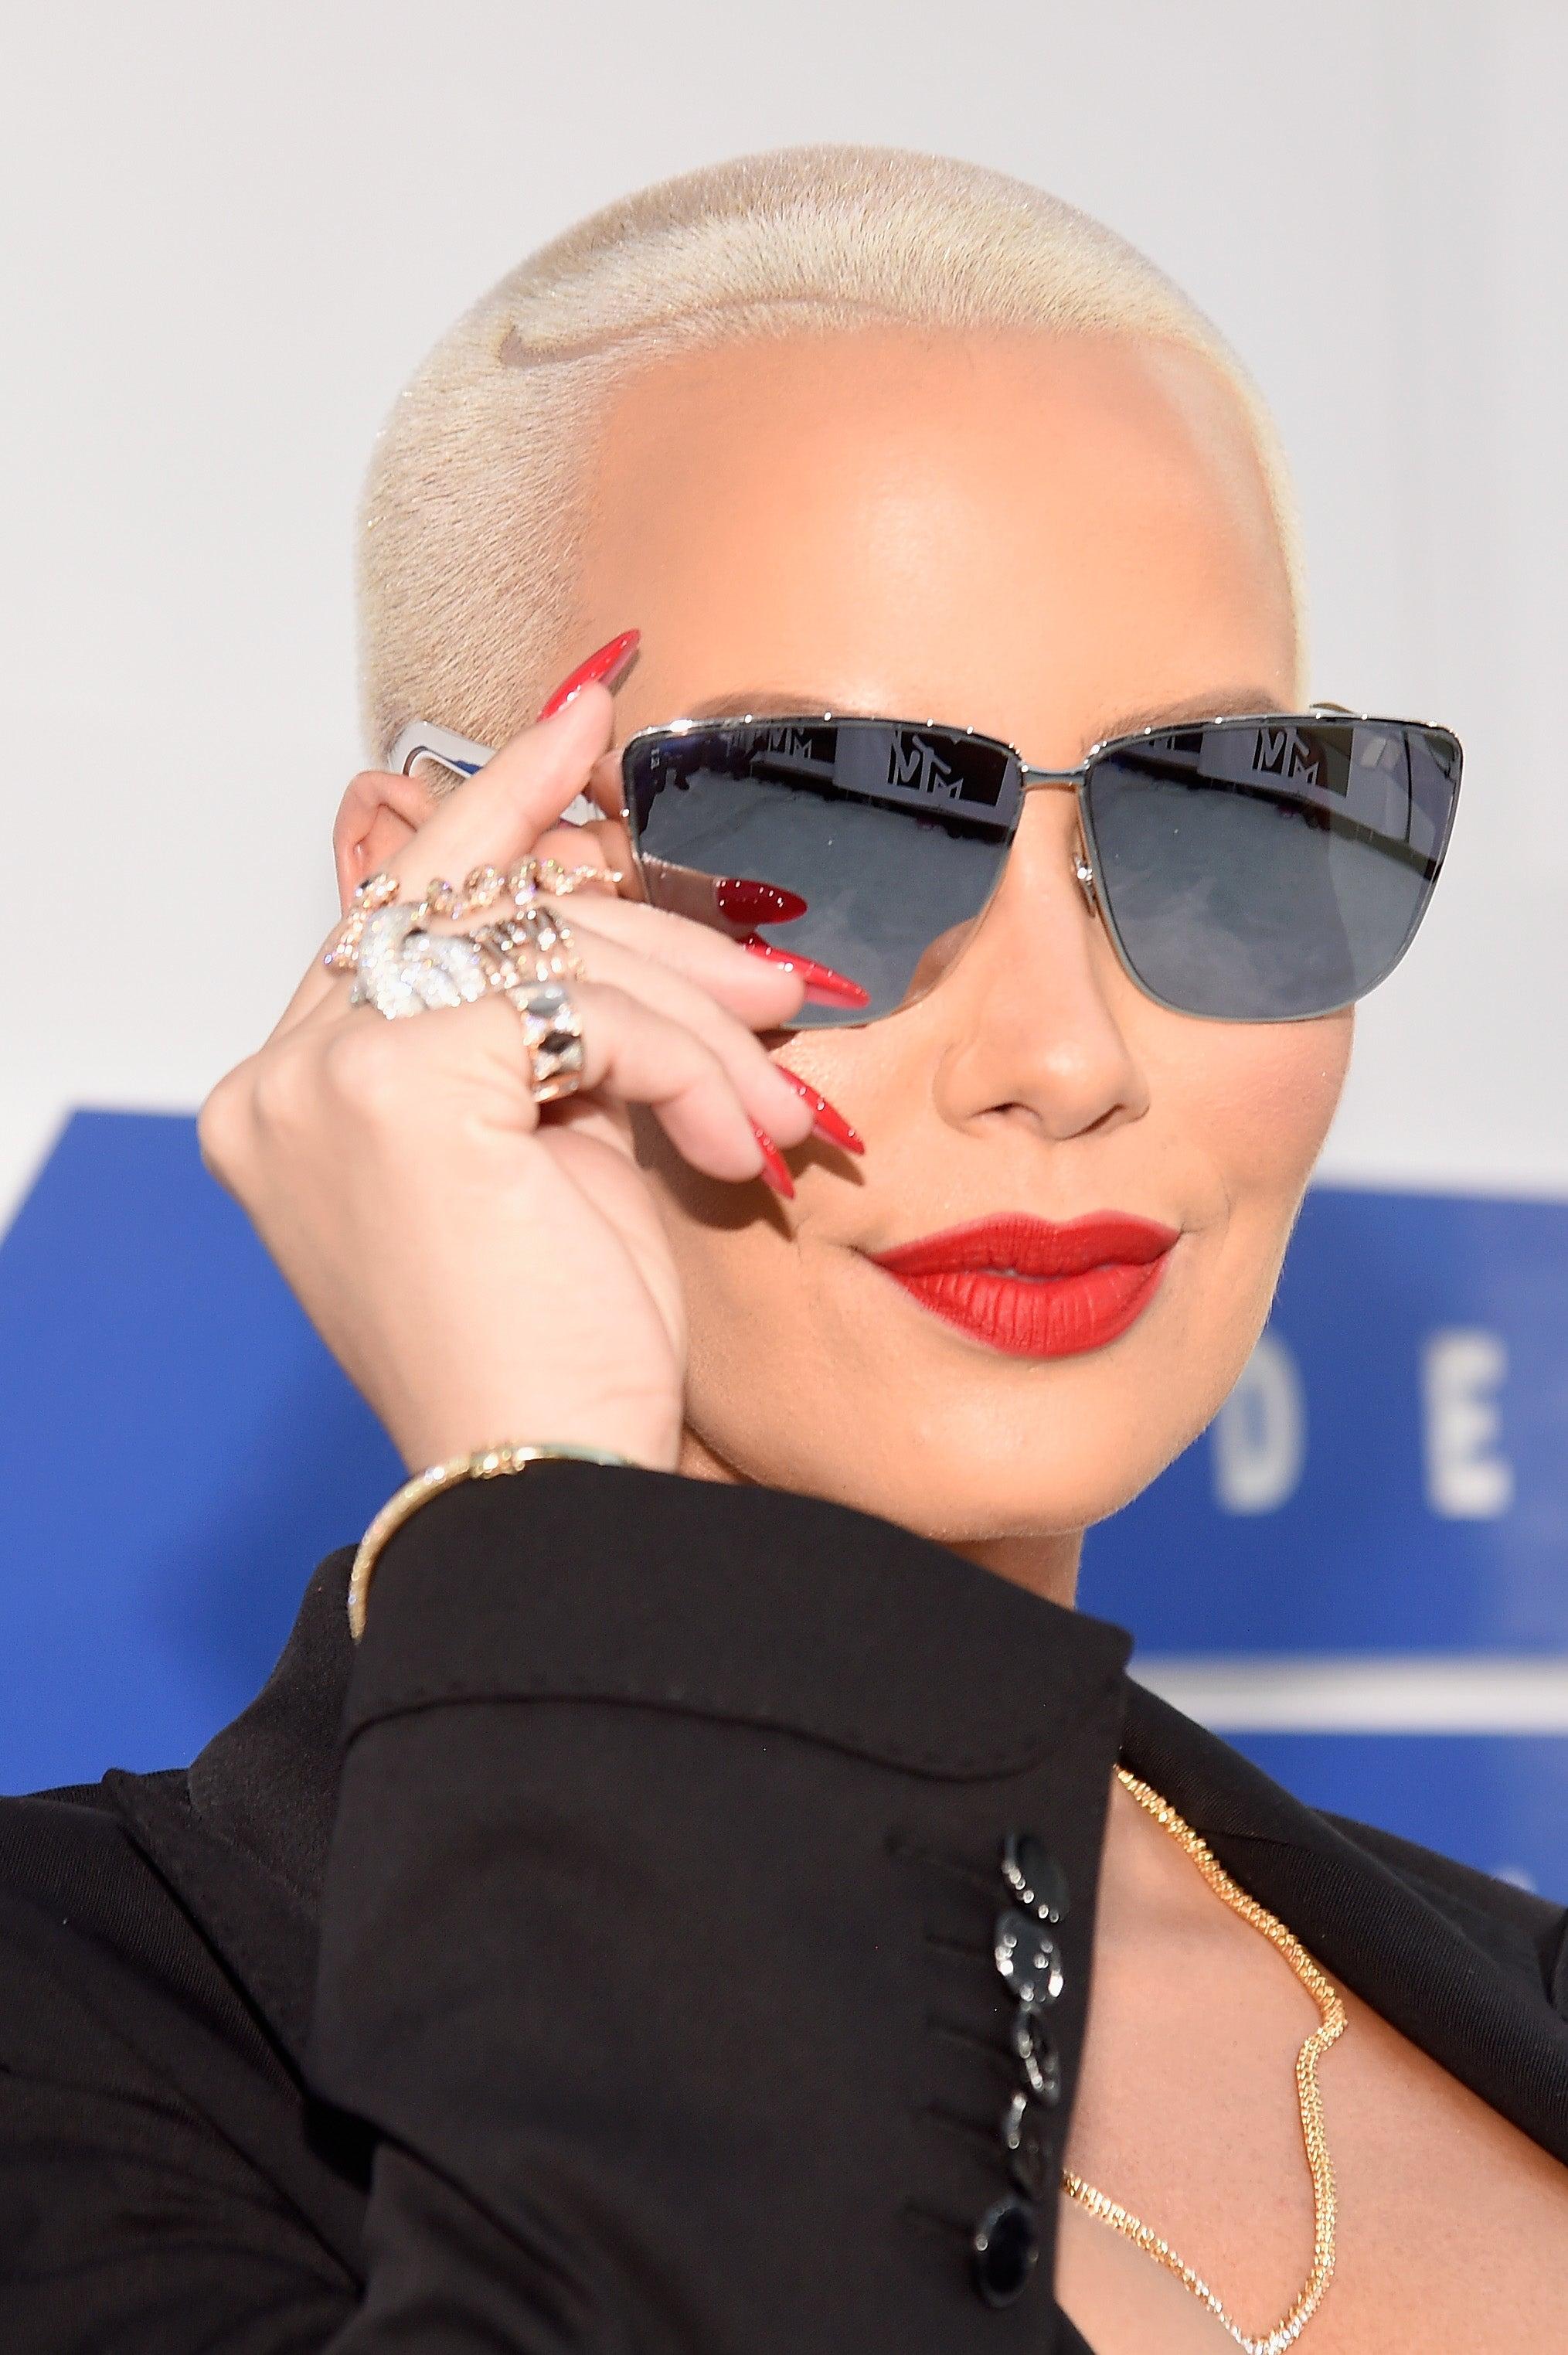 amber rose stiletto nails, manicure, celebrity | Fav ... |Stiletto Nails Amber Rose